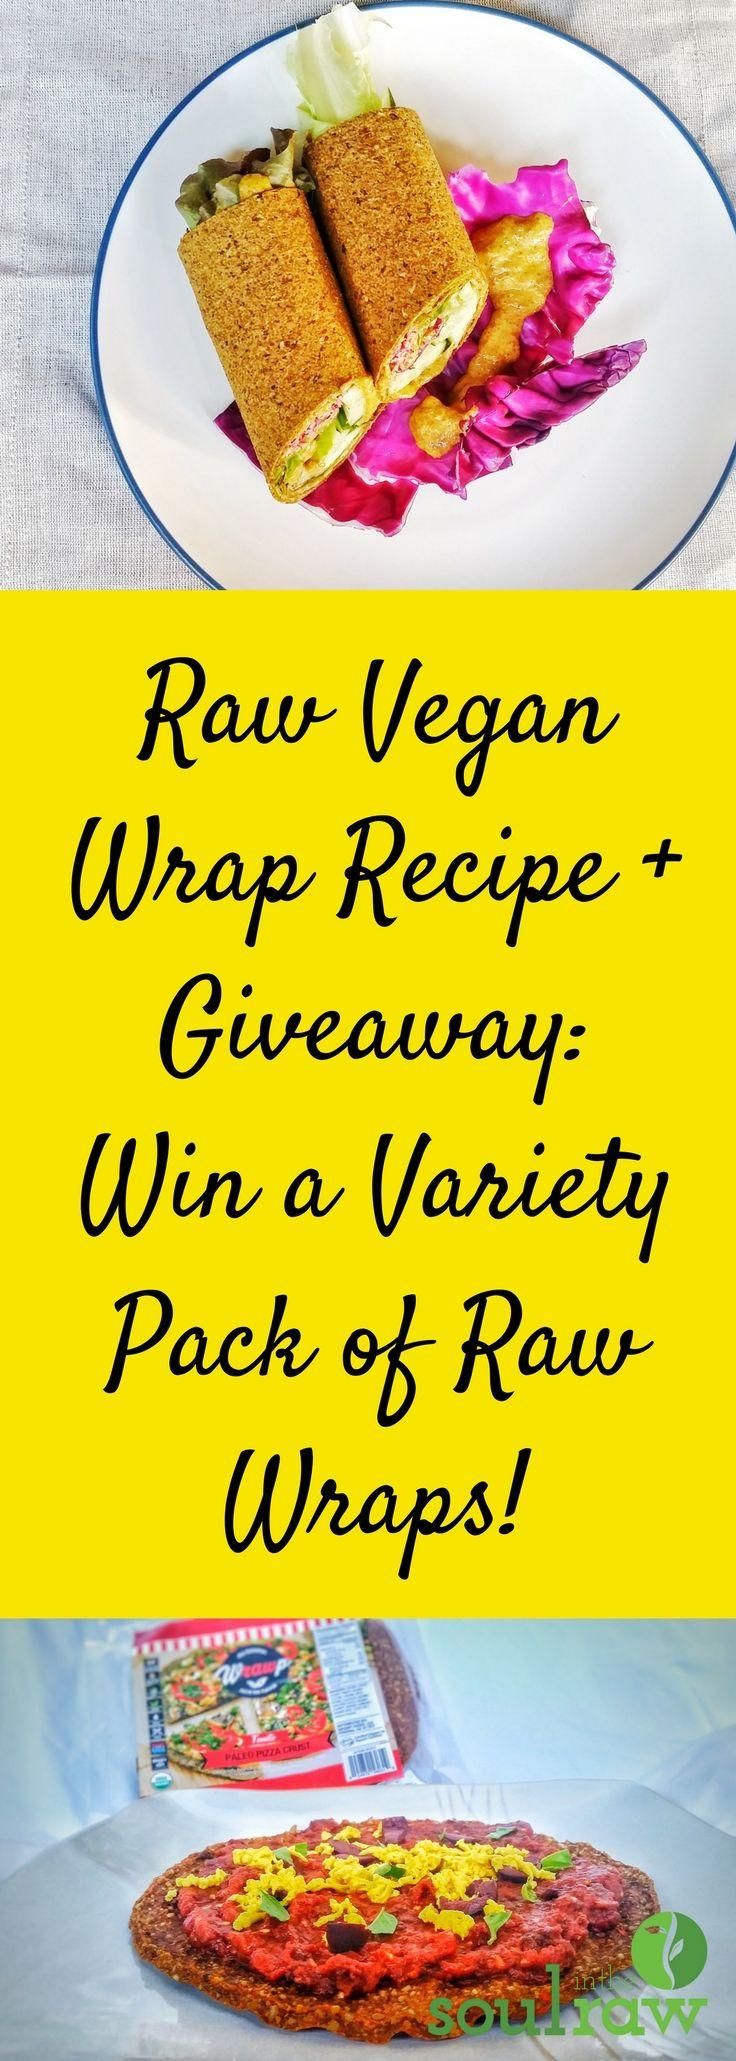 Raw Vegan Wraps Recipe No Dehydrator Needed Recipe Raw Vegan Wrap Recipes Whole Food Recipes